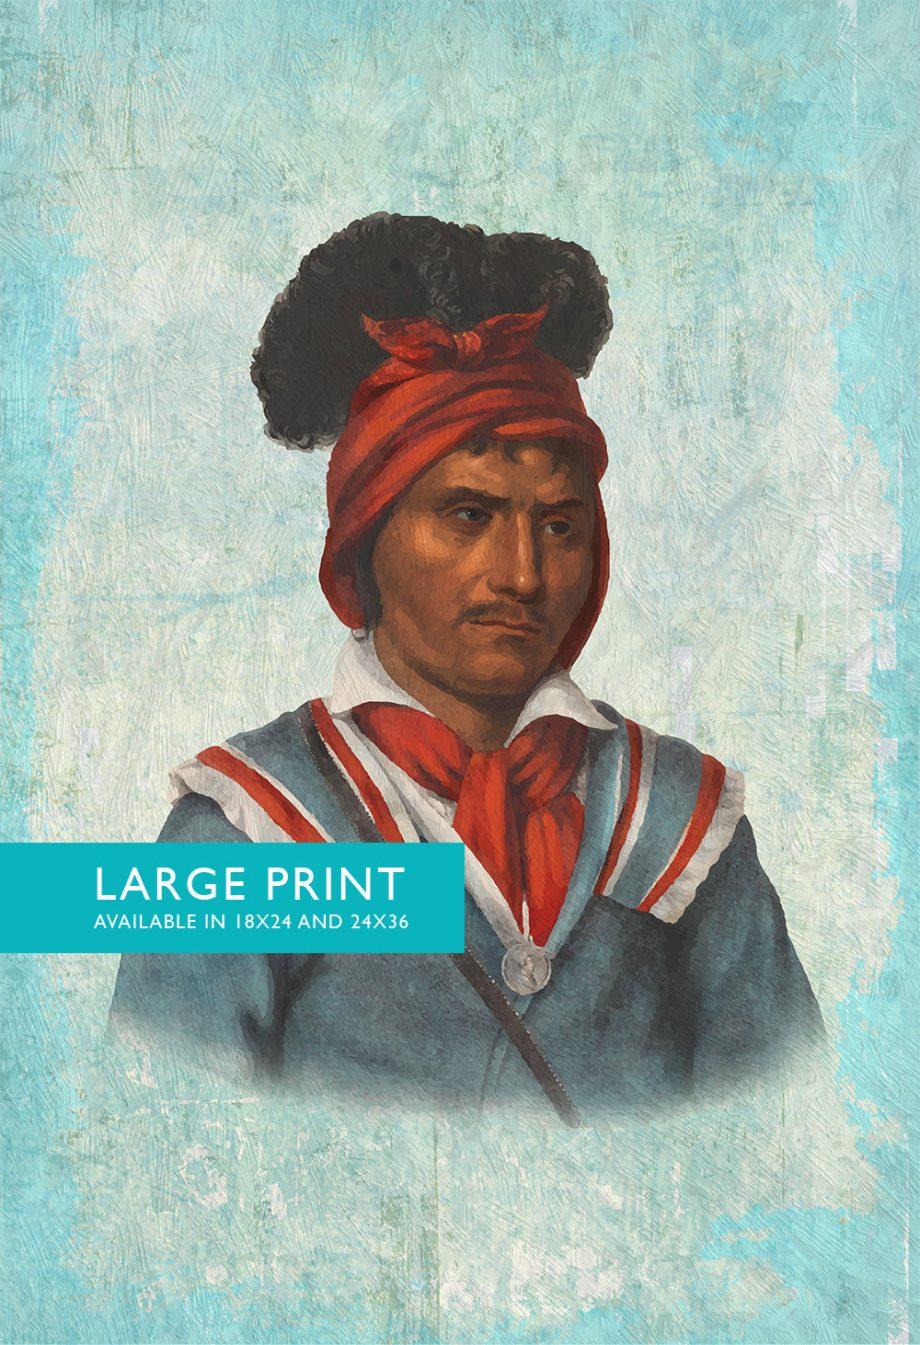 Vintage Seminole Man Native American Man Art Print Vintage Giclee on Cotton Canvas and Satin Photo Paper